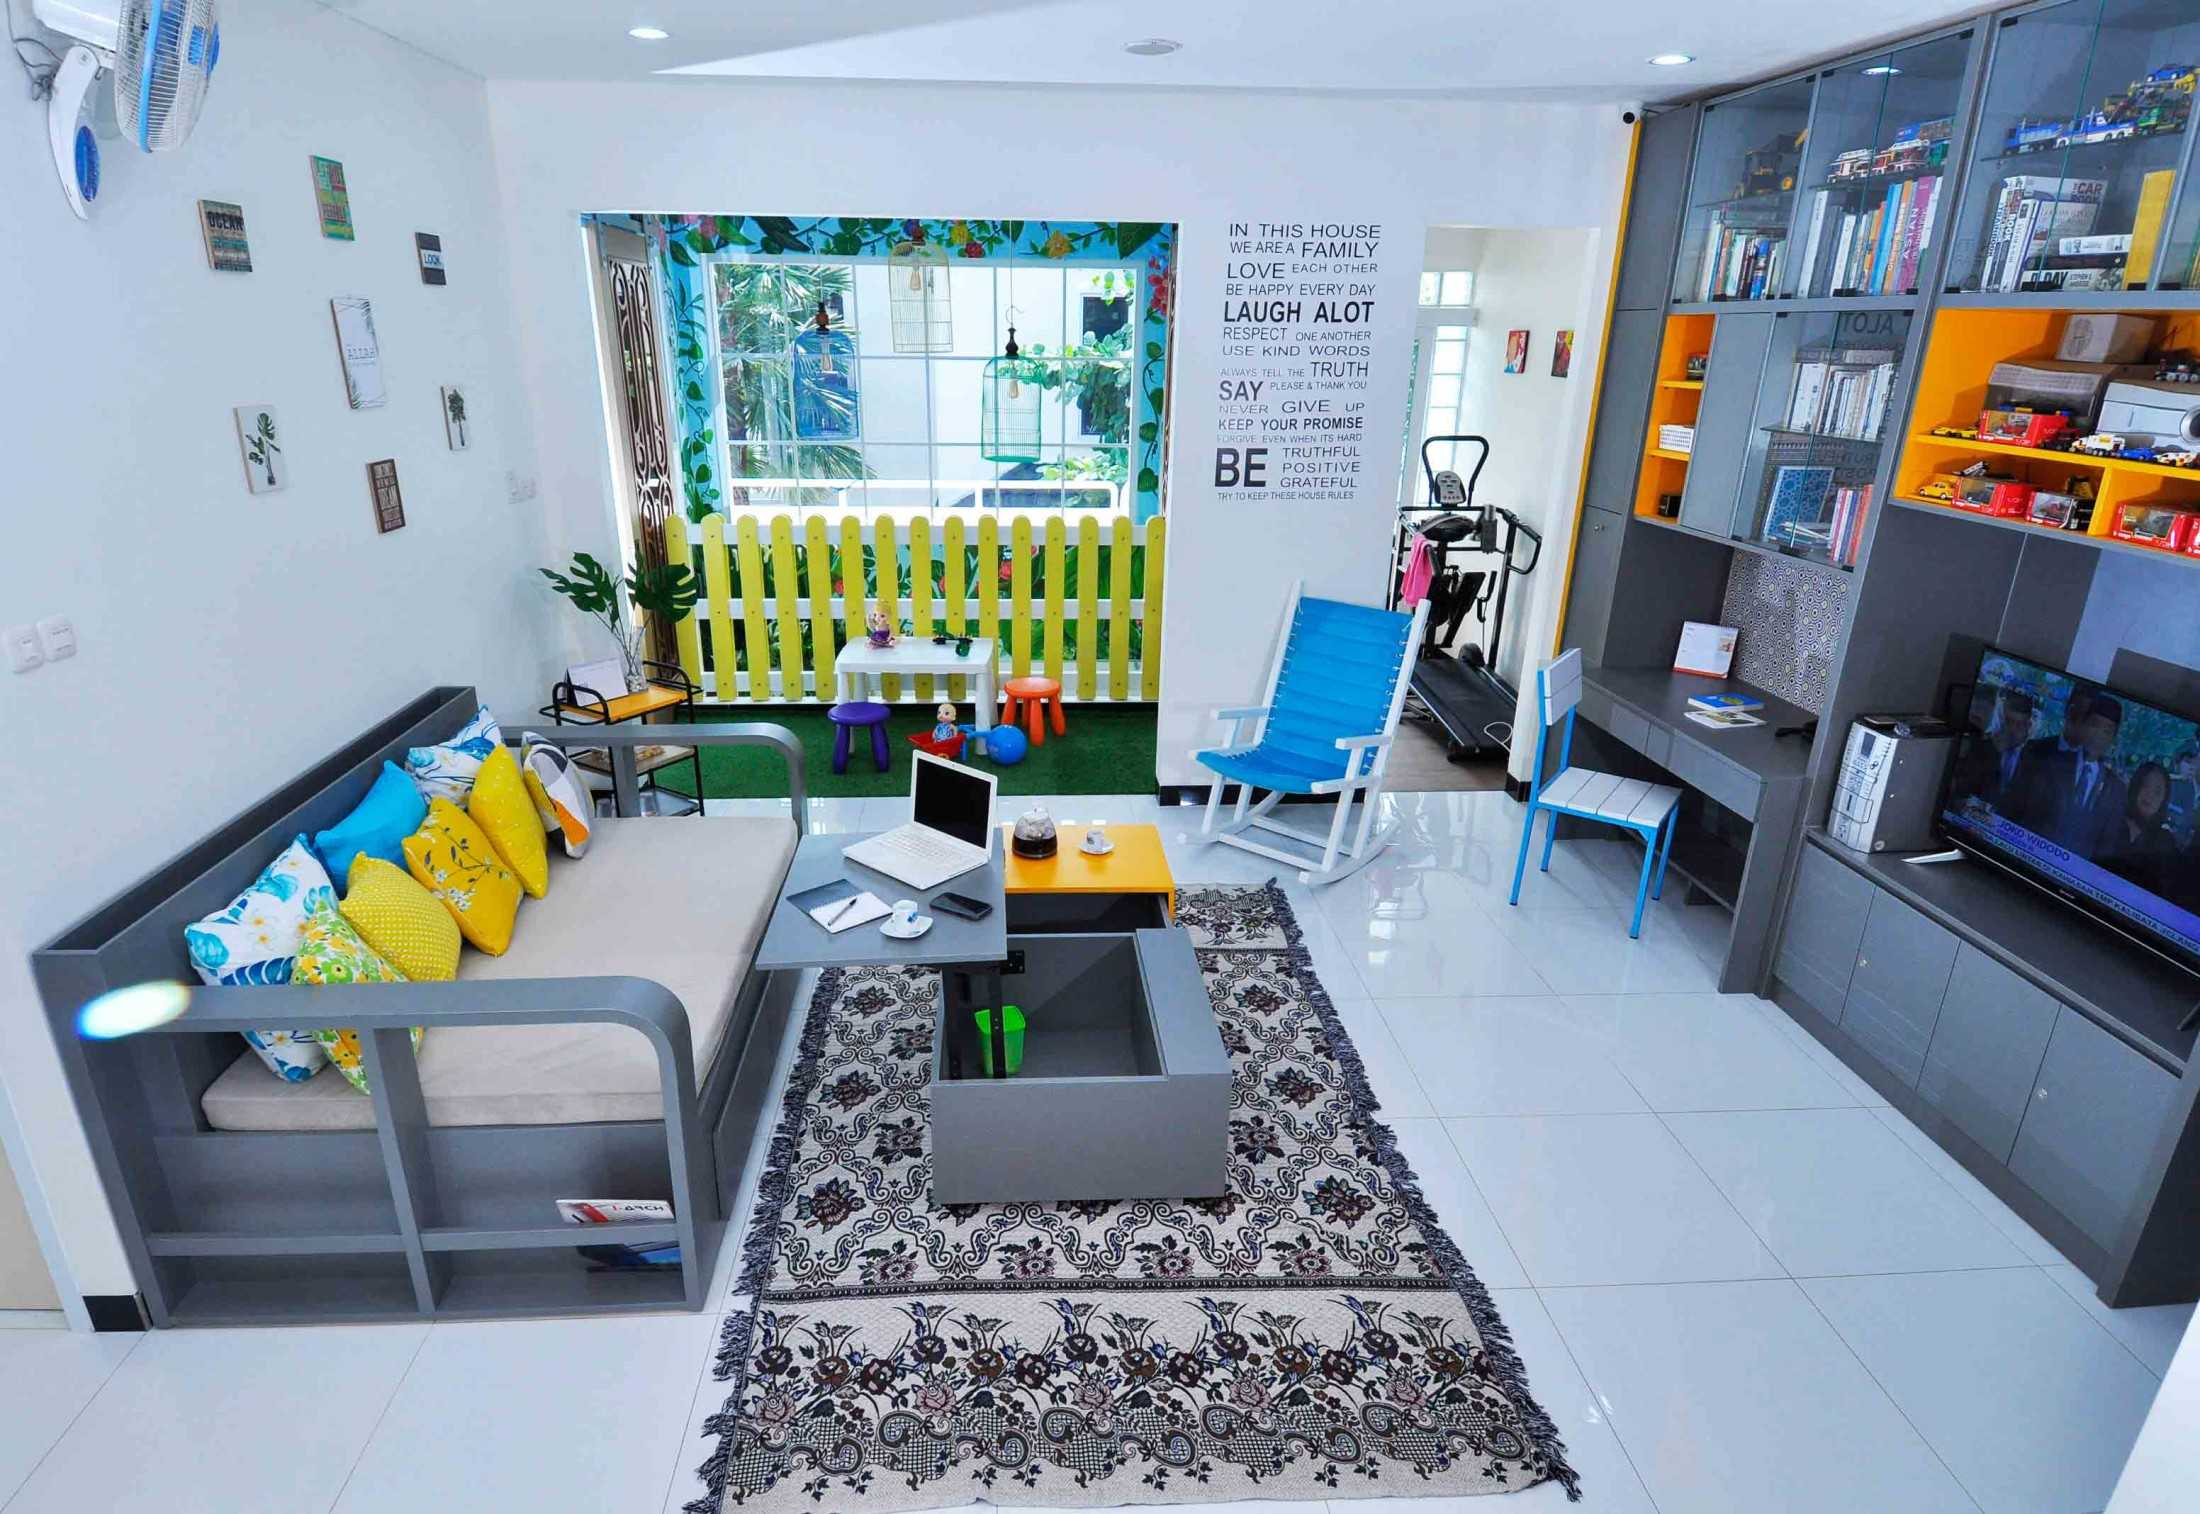 Arsigram Home Interior Built In Jln Alteri Bintaro No.78 Rt 007/001, Bintaro Jaya, Kec. Pd. Aren, Kota Tangerang Selatan, Banten, Indonesia Jln Alteri Bintaro No.78 Rt 007/001, Bintaro Jaya, Kec. Pd. Aren, Kota Tangerang Selatan, Banten, Indonesia Arsigram-Home-Interior-Built-In Modern 82756